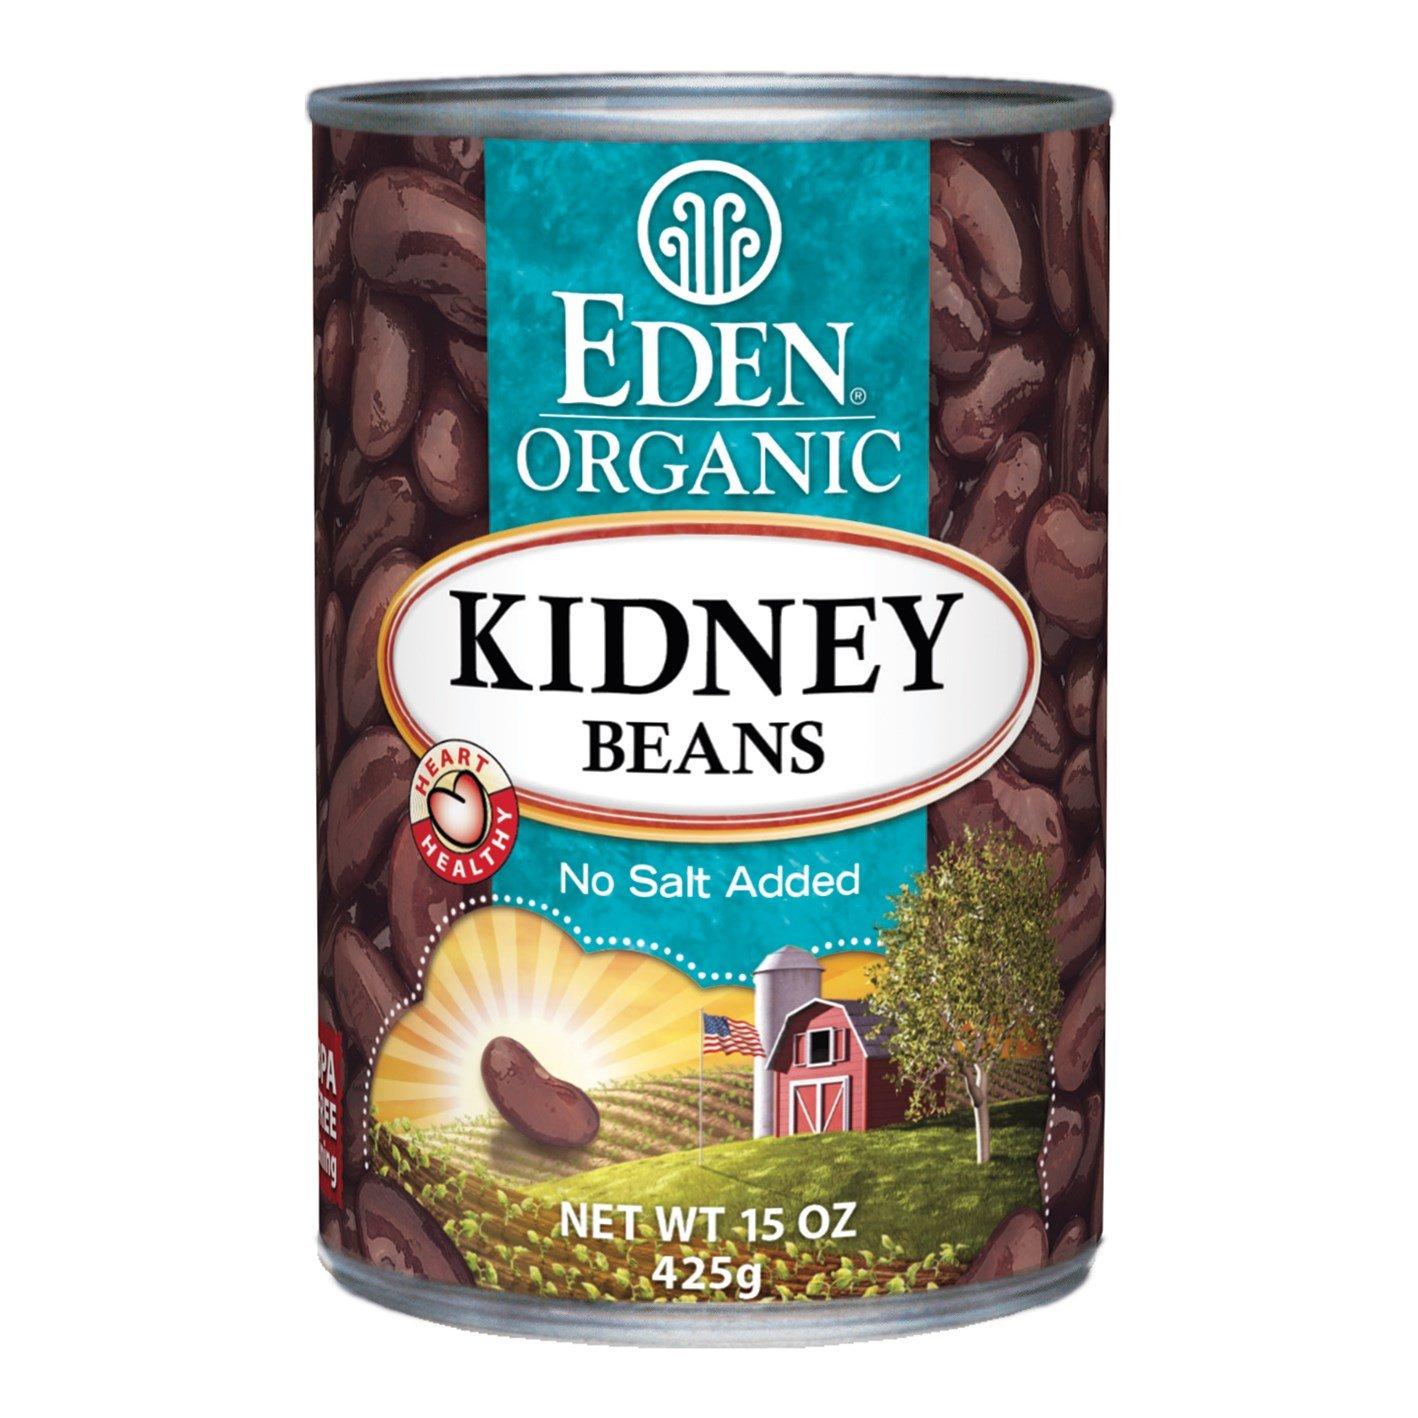 Eden Organic Kidney Beans, No Salt Added, 15-Ounce Cans (Pack of 12)